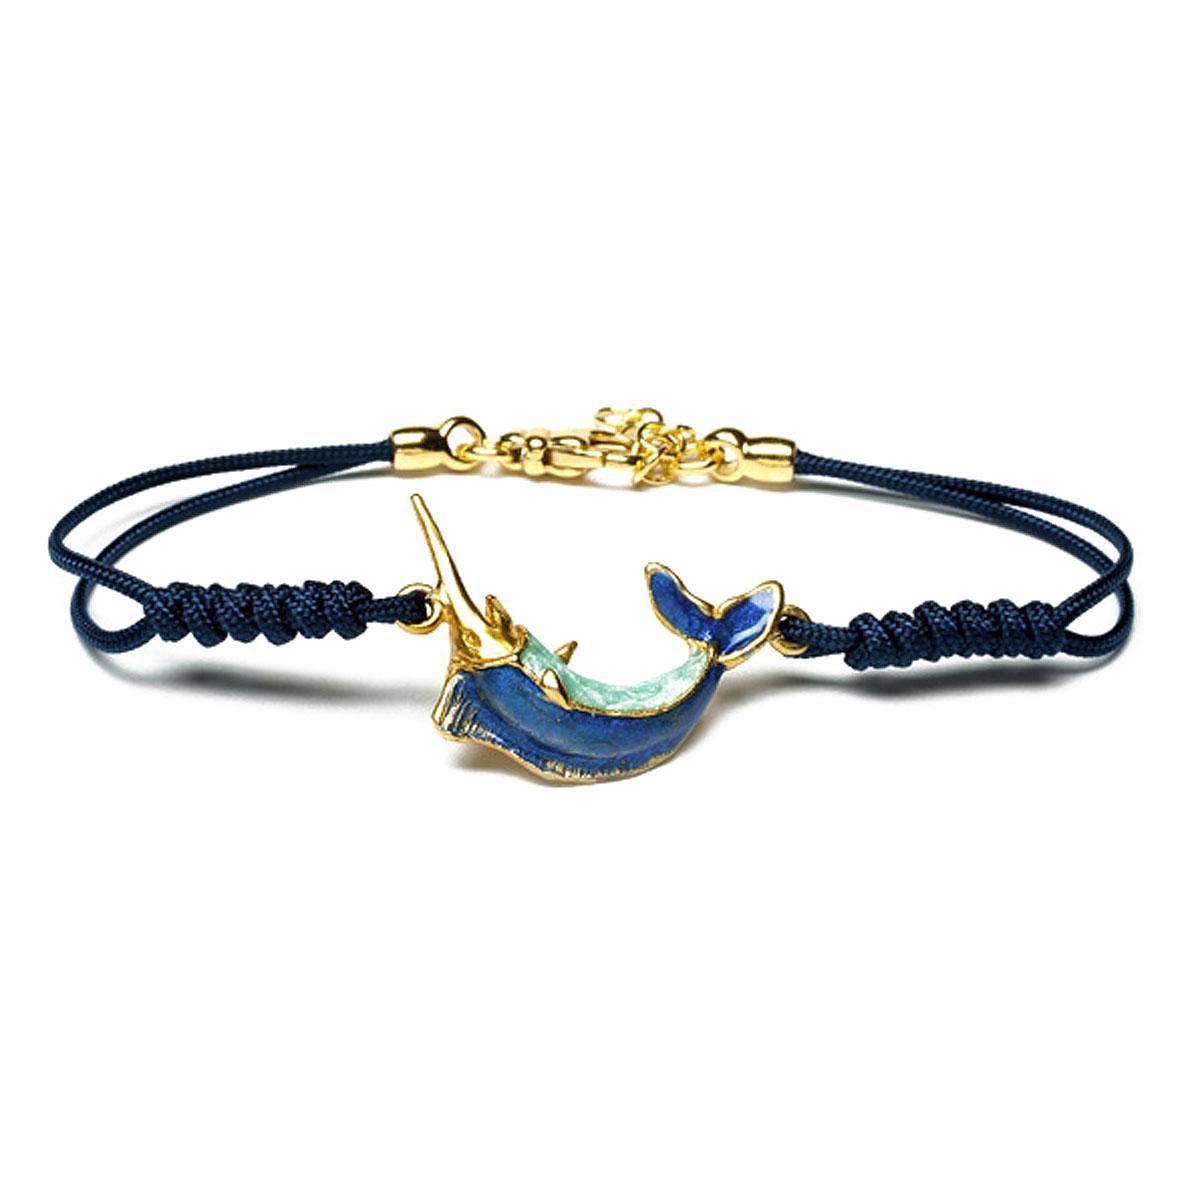 Image of Isola Bella Bracelet for Women, Blue, Silver 925 Galvanized Gold, 2017